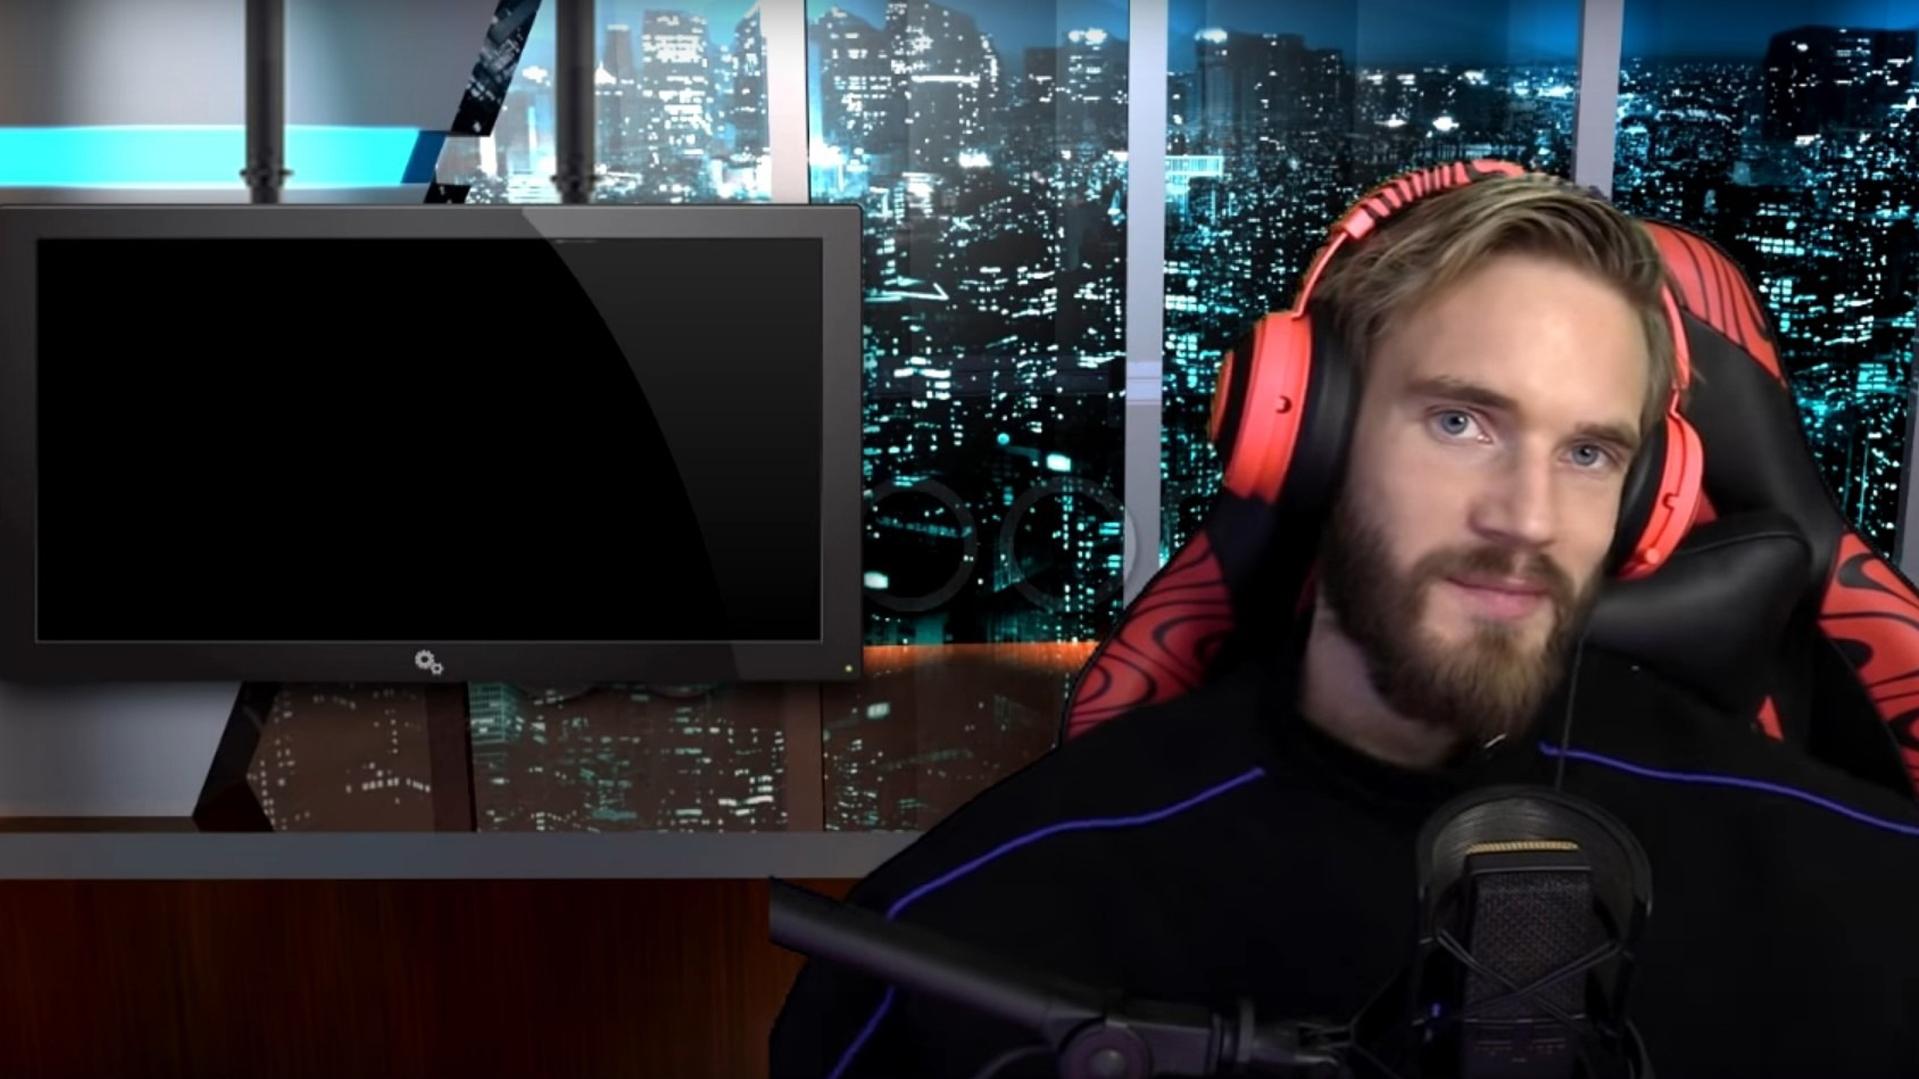 PewDiePie, YouTube